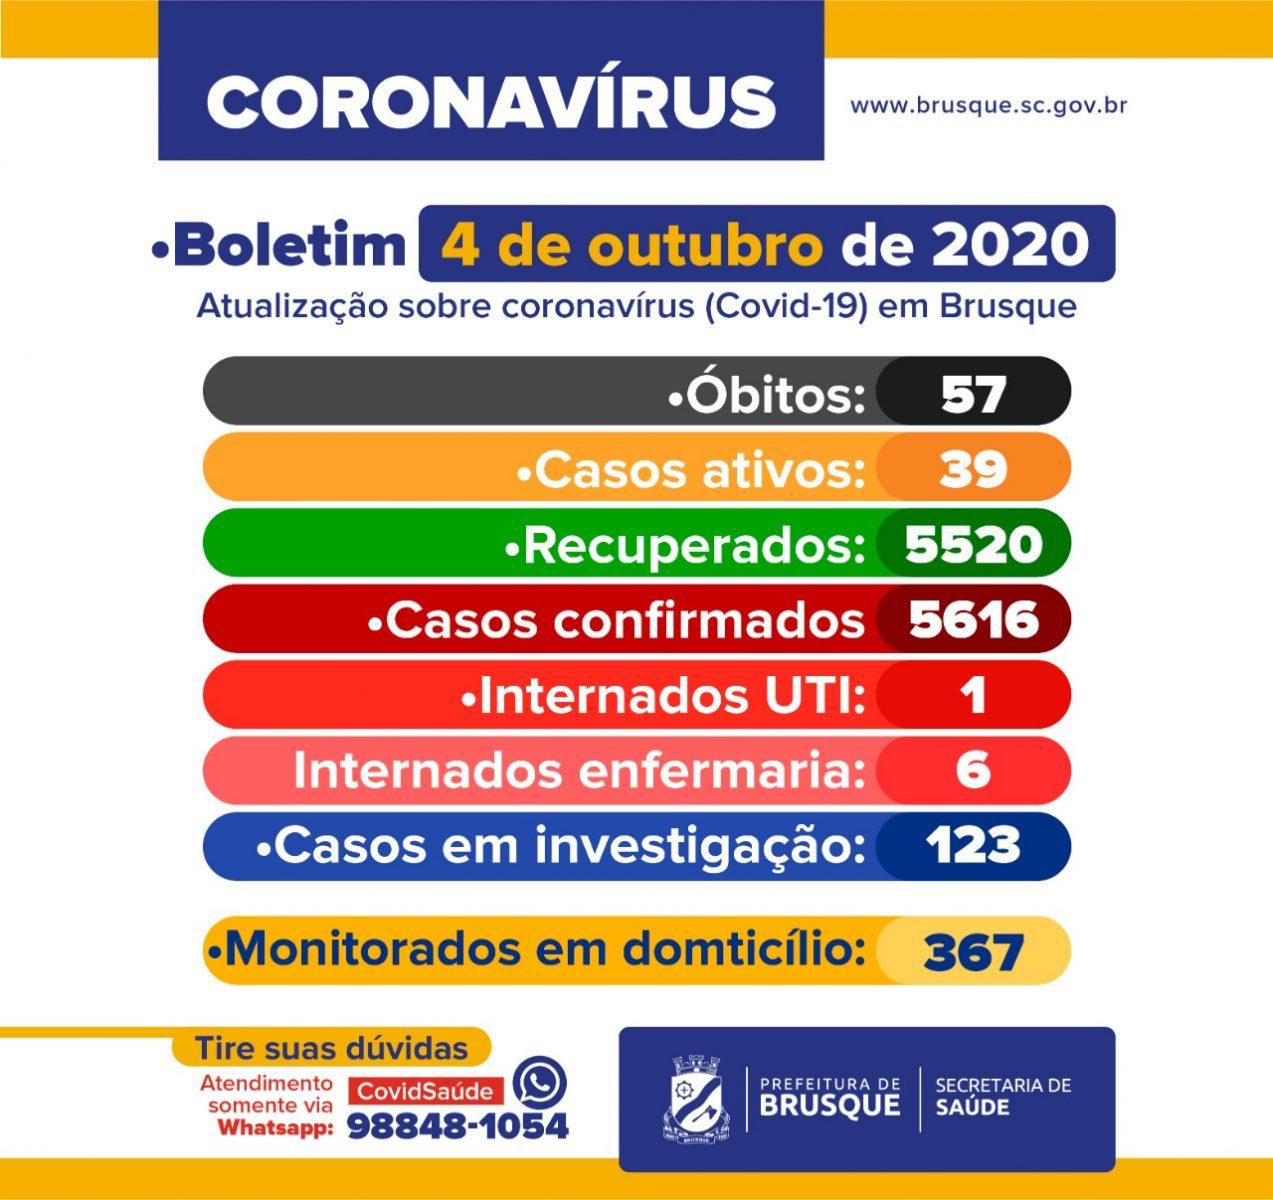 COVID-19: Boletim epidemiológico 4 de outubro